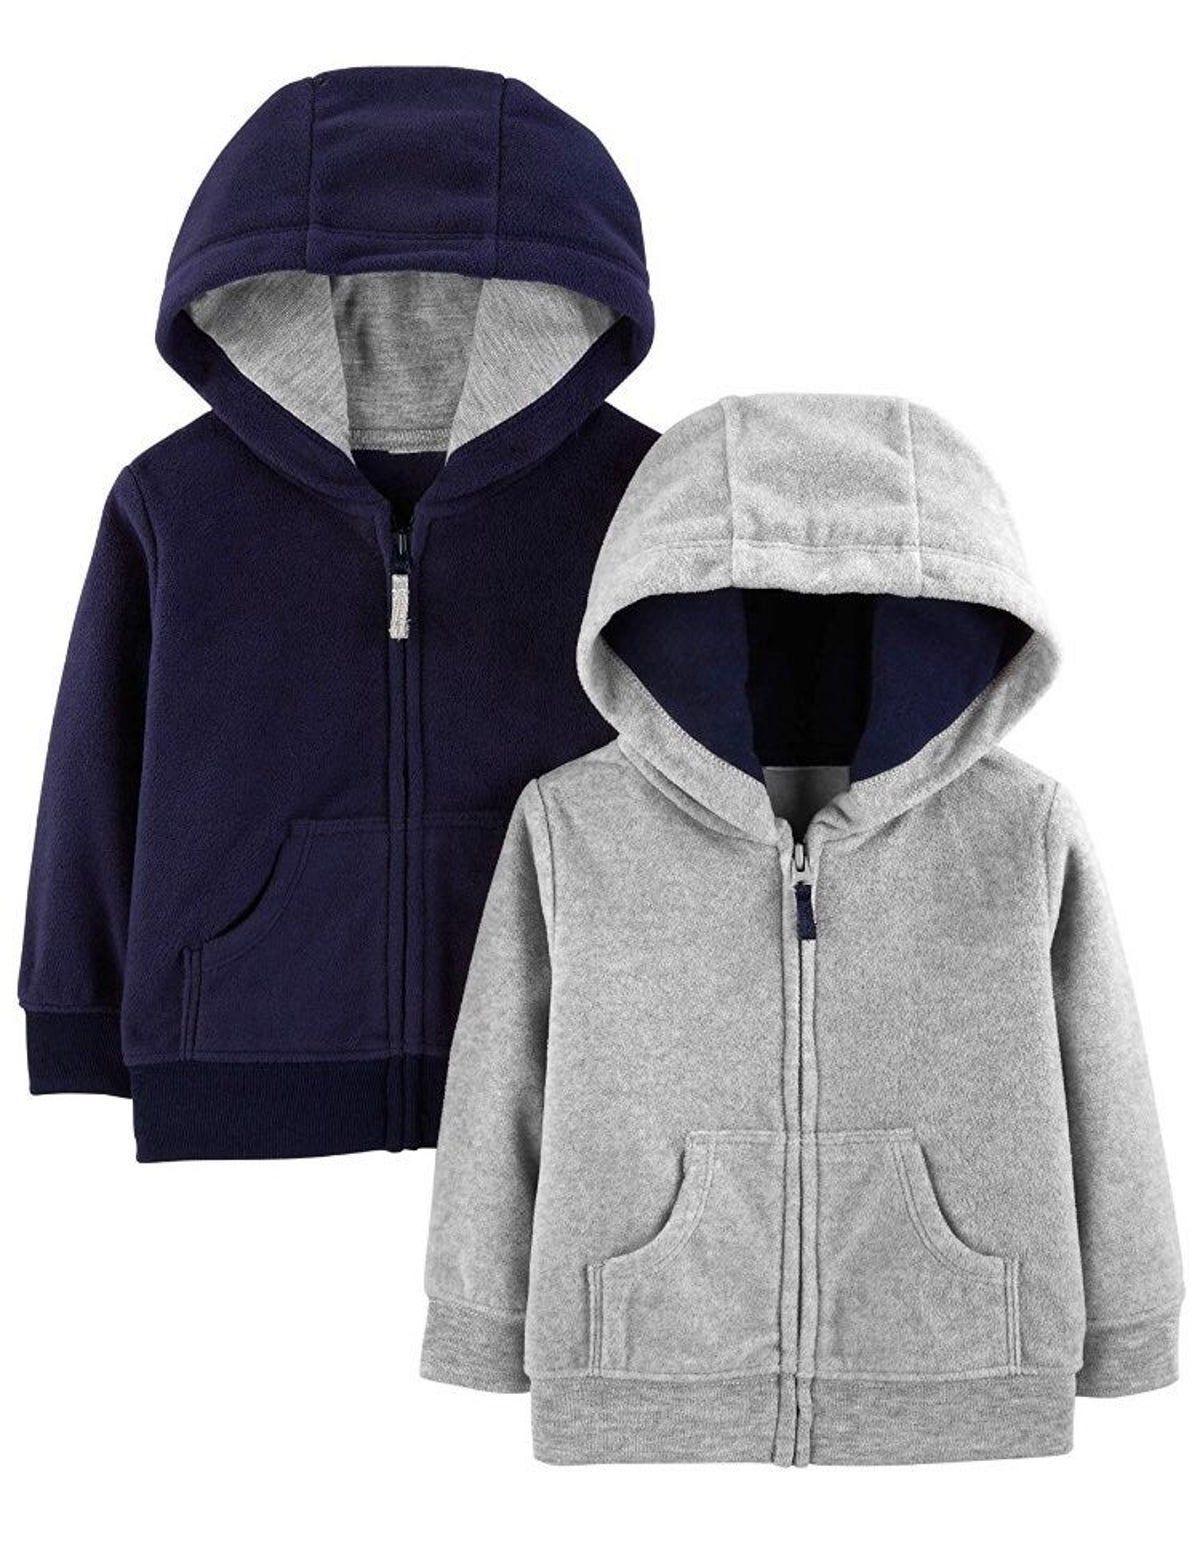 Baby Boys 2-Pack sweaters -  Baby Boys 2-Pack sweaters  - #2Pack #Baby #Boys #heelsclassydressy #sweaters